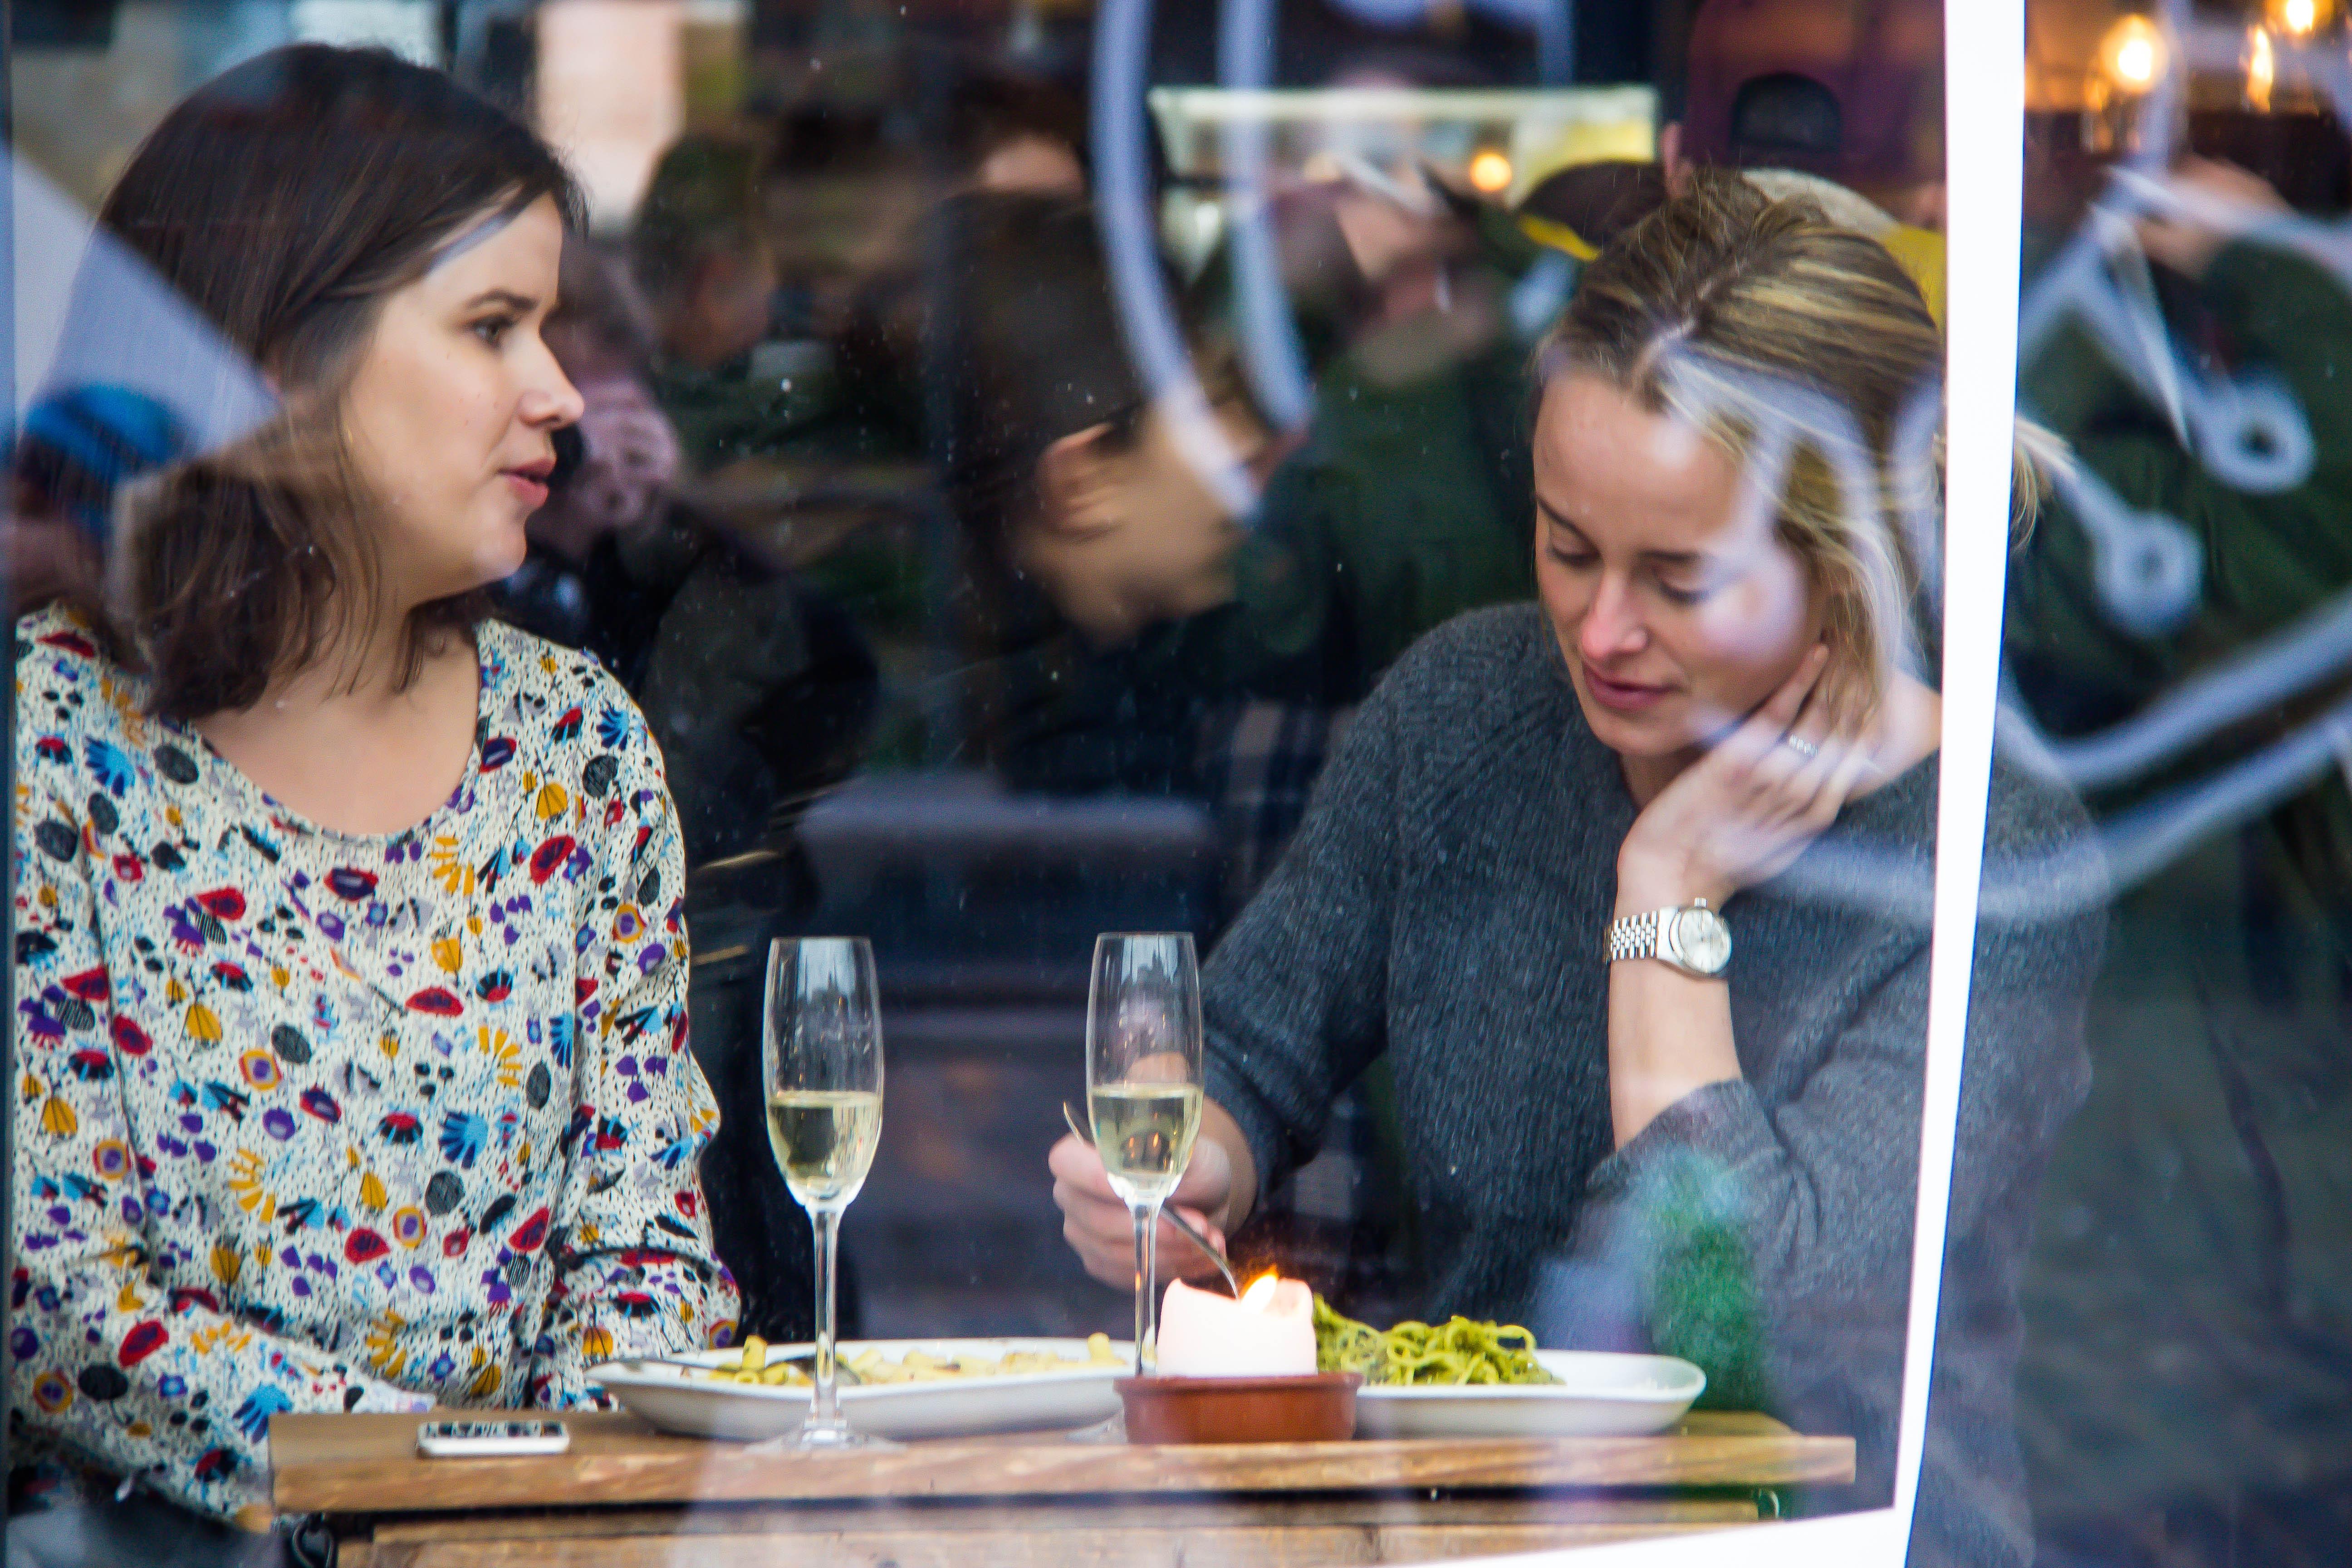 Six Best Places To Find A Happn Date In Copenhagen